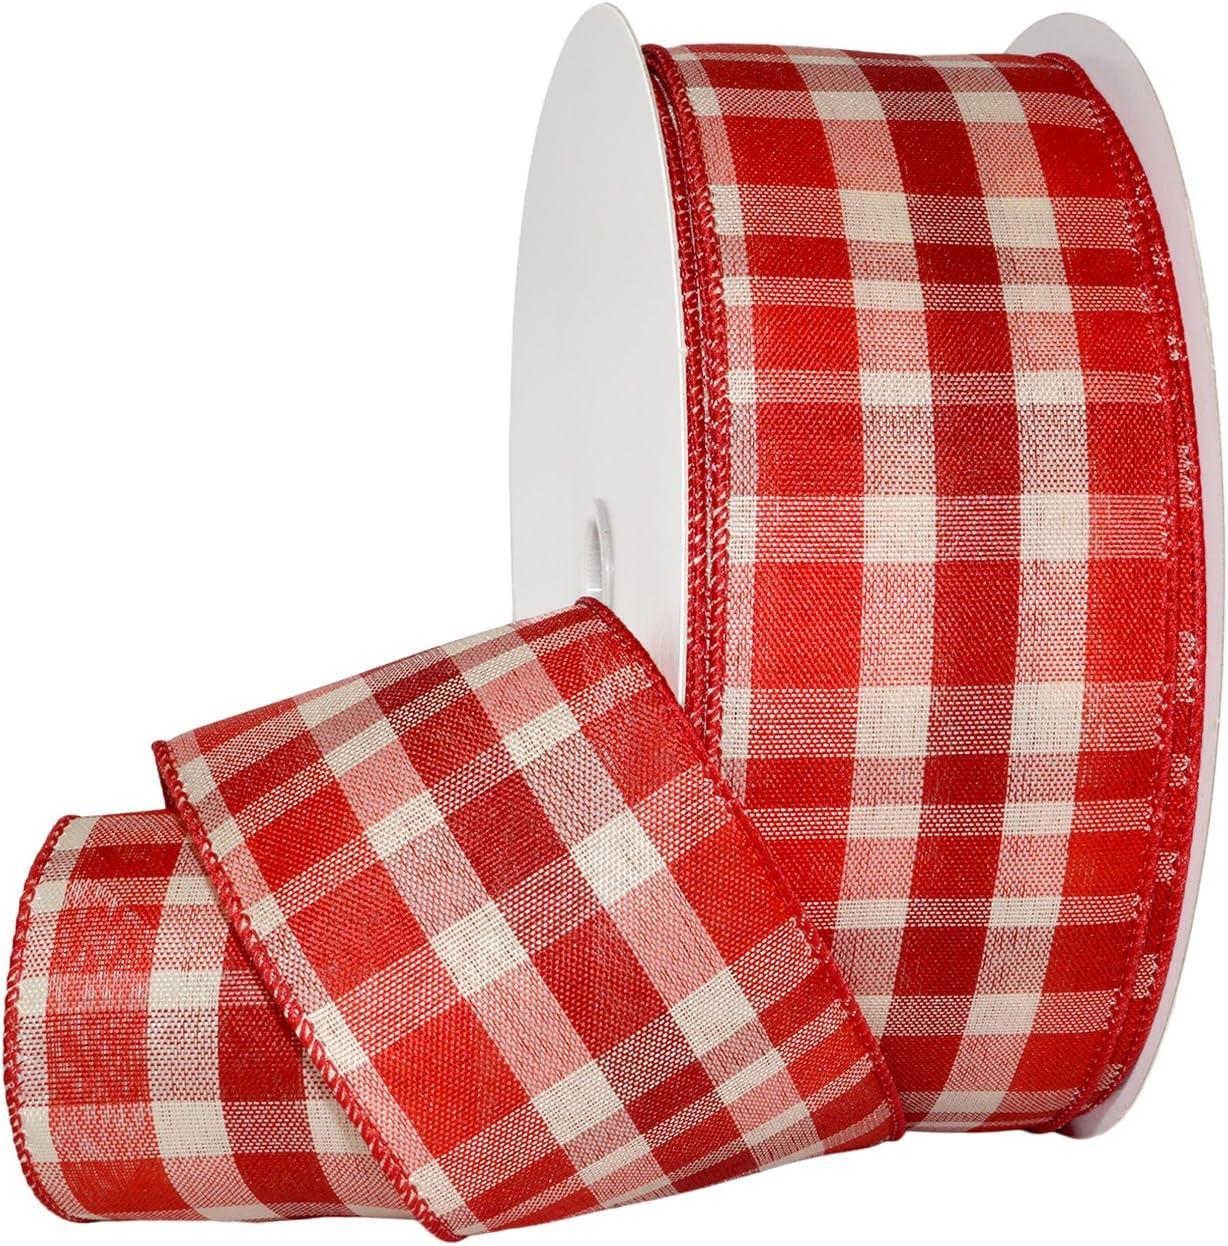 2-1//2 inches by 50 Yard Morex Ribbon Splendor Wired Nylon Ribbon Red